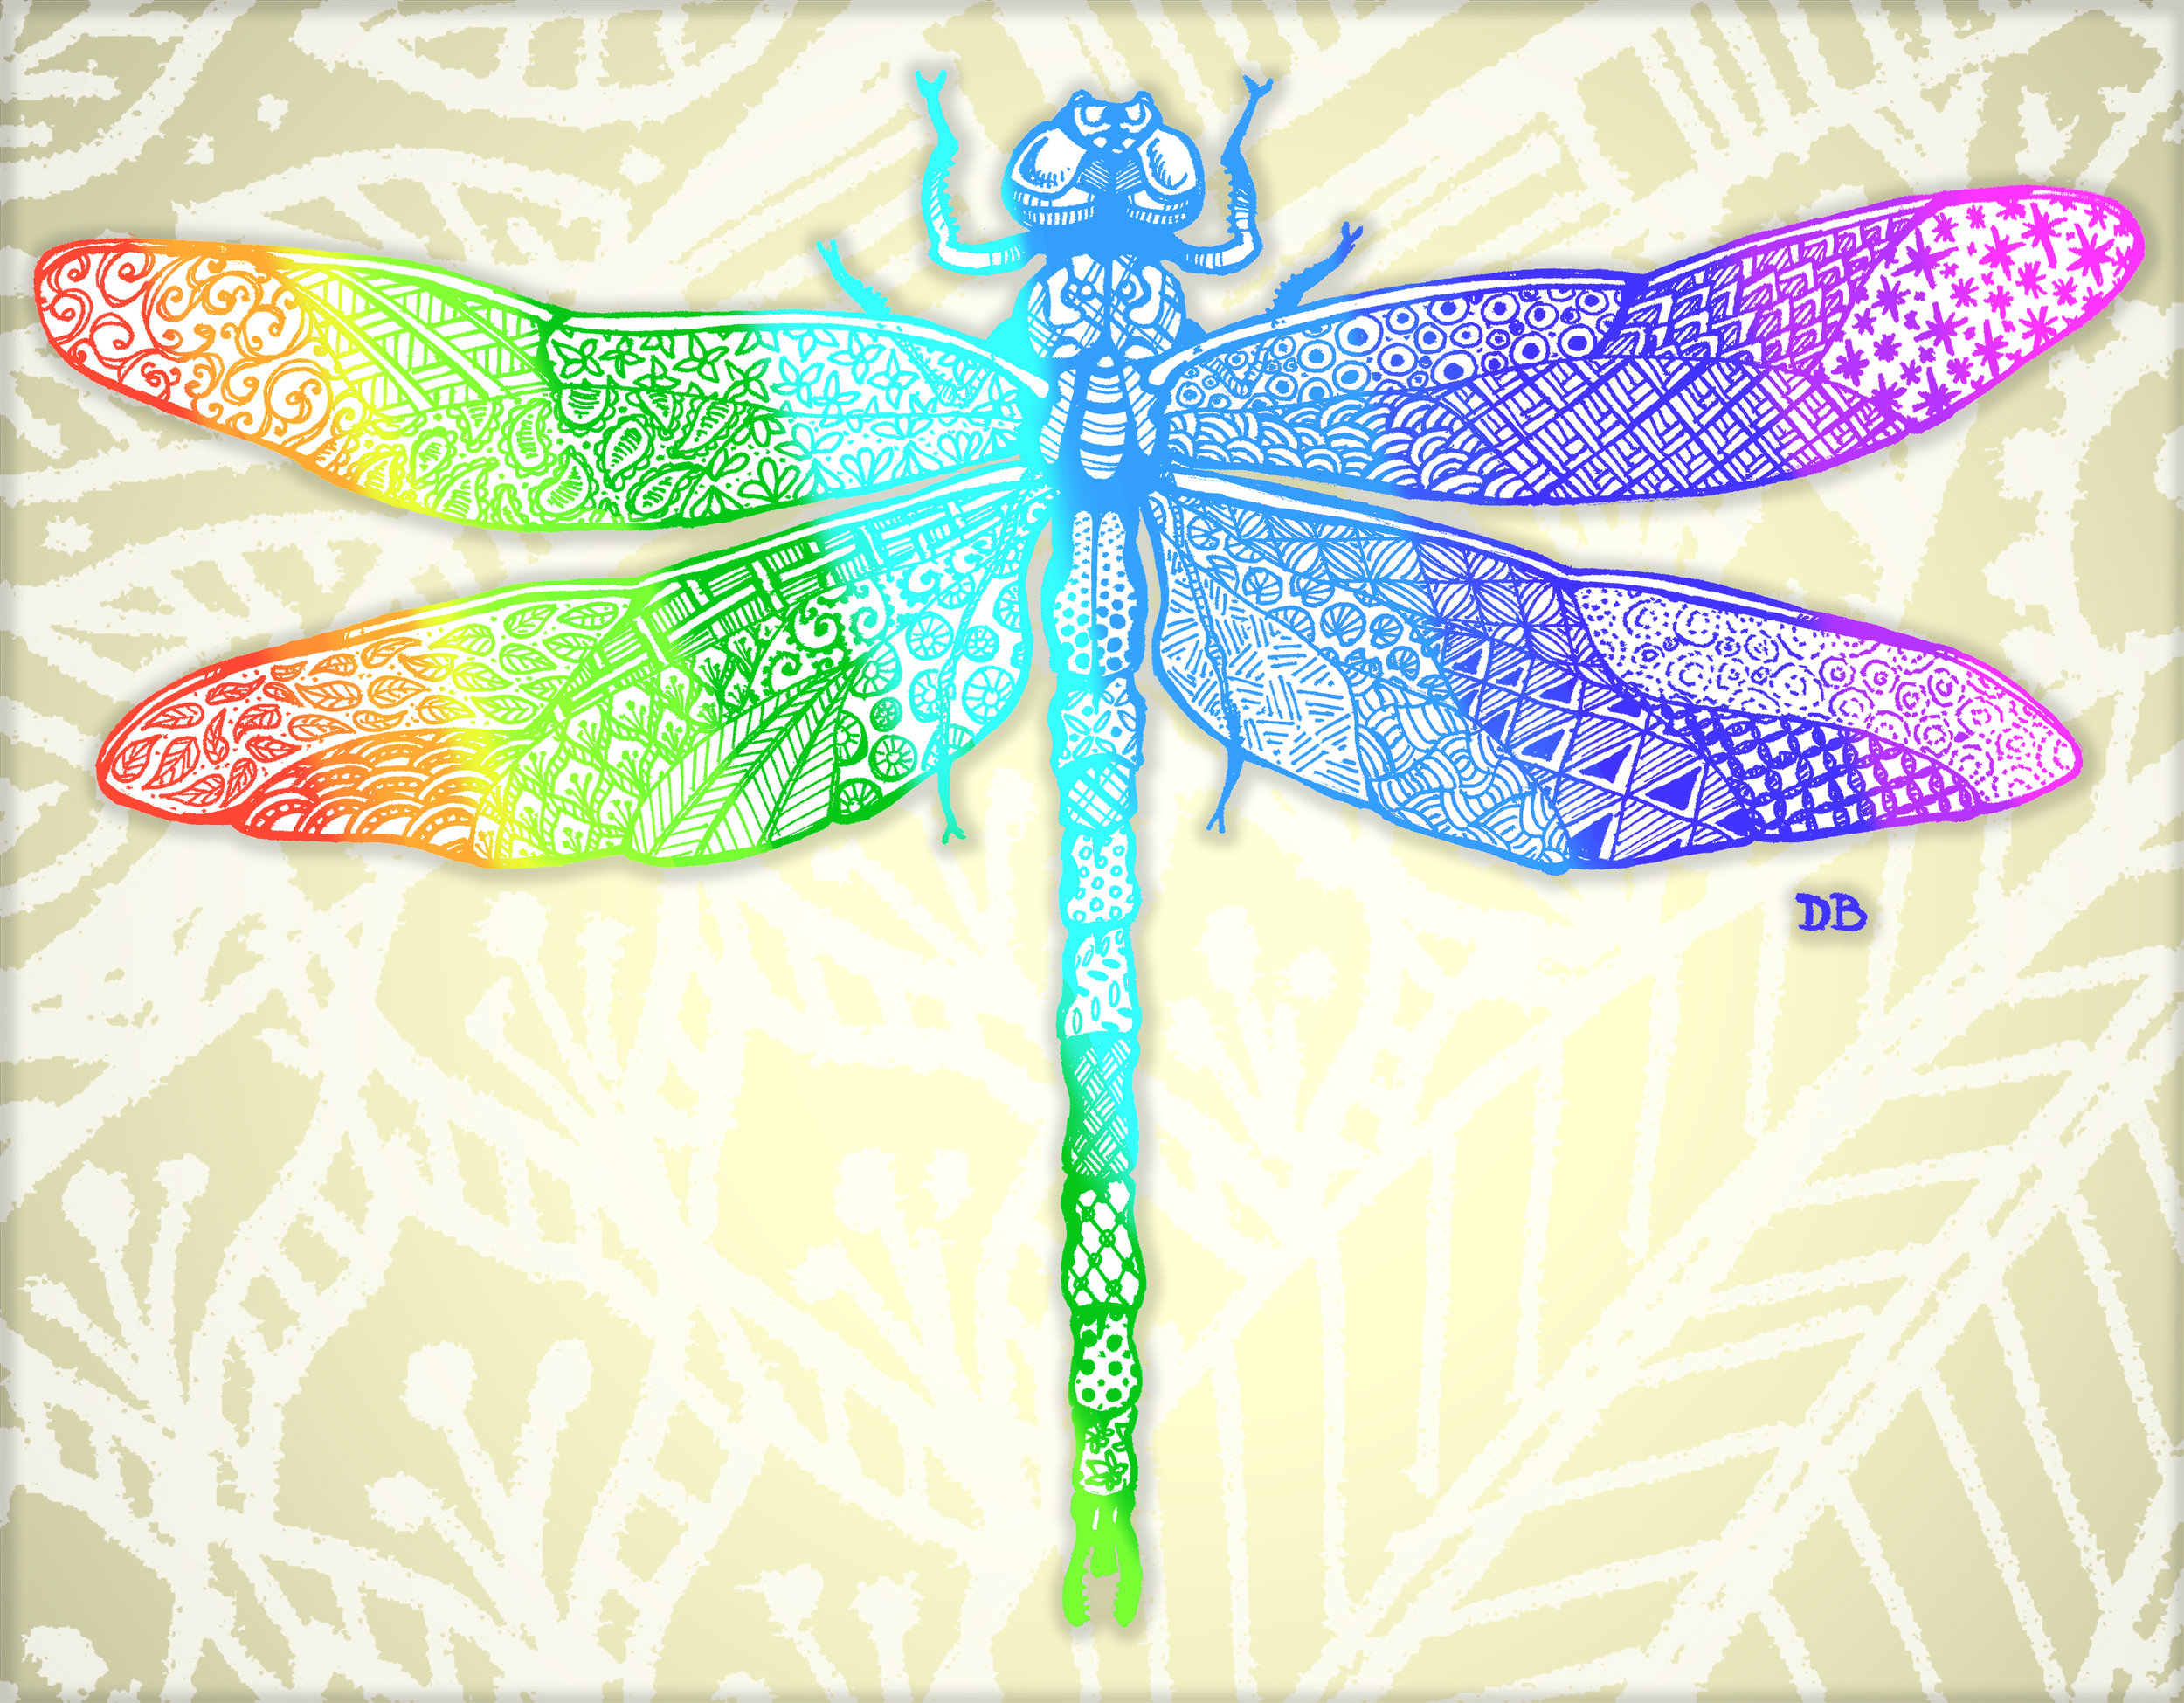 Zen Dragon Fly